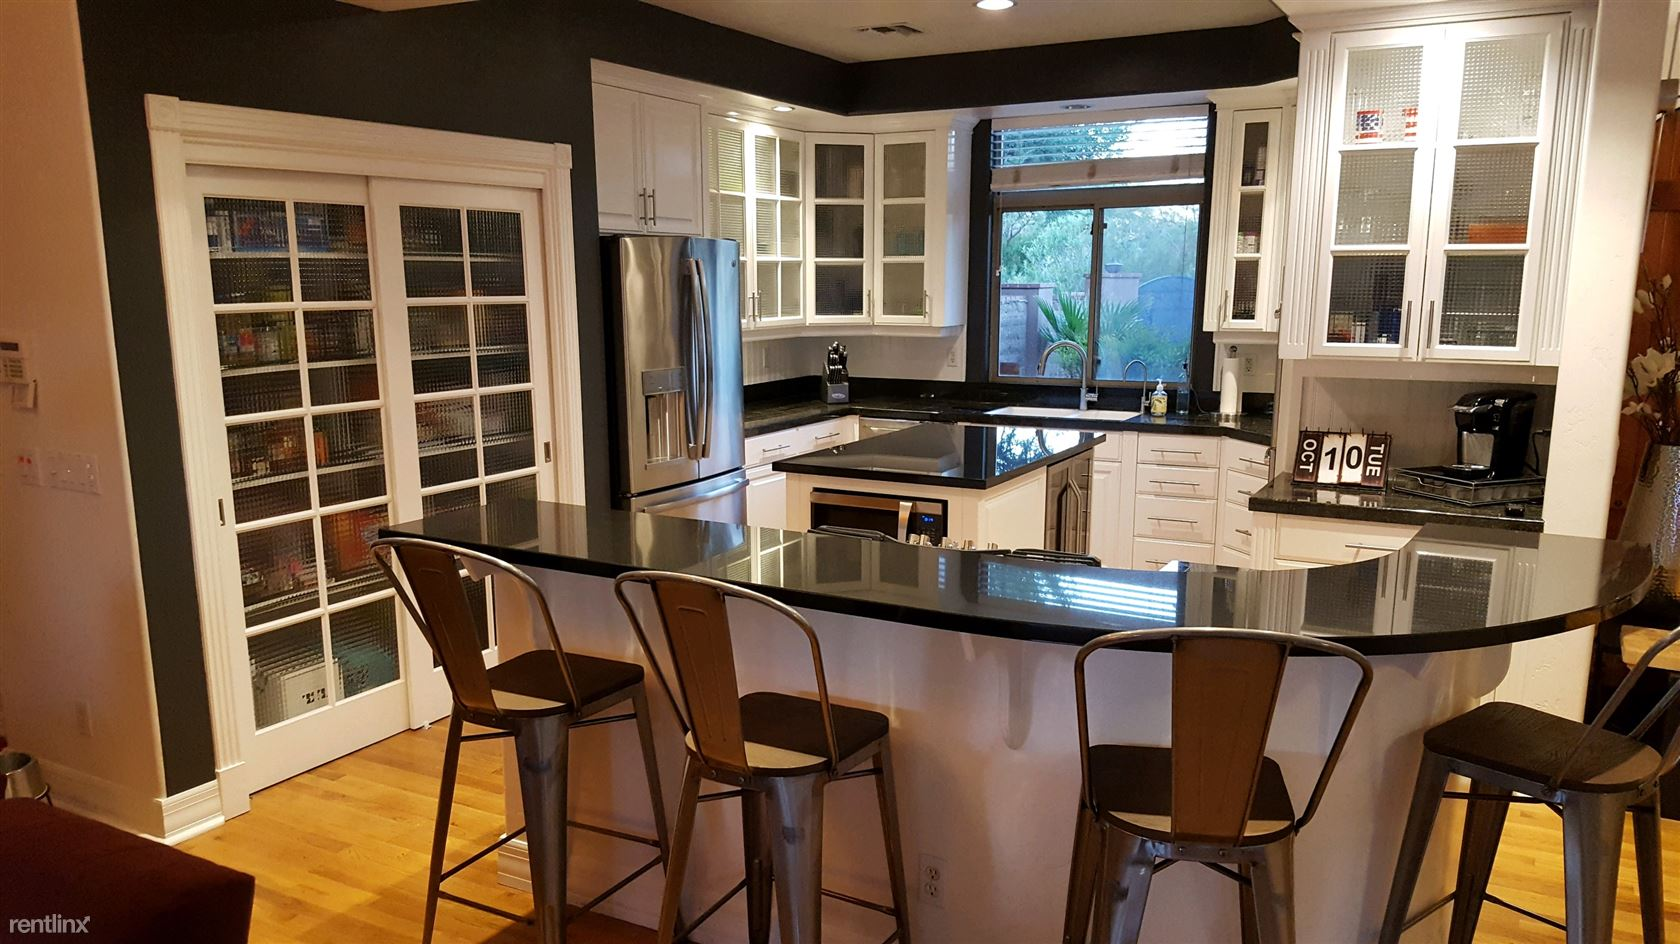 Similar Apartment at 3424 N Olsen Ave